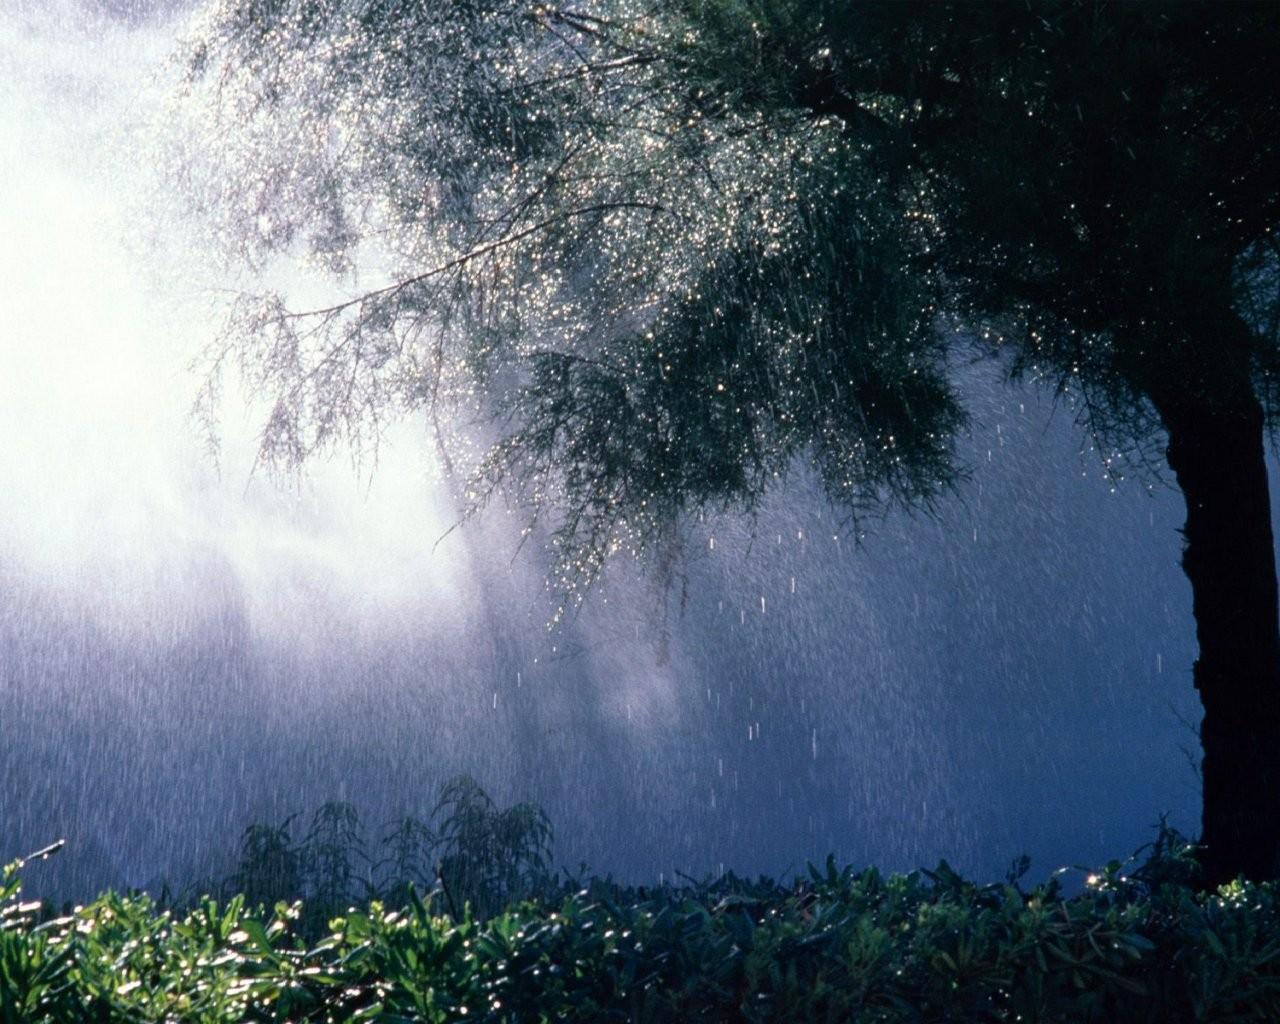 картинки на тему дождь в лесу